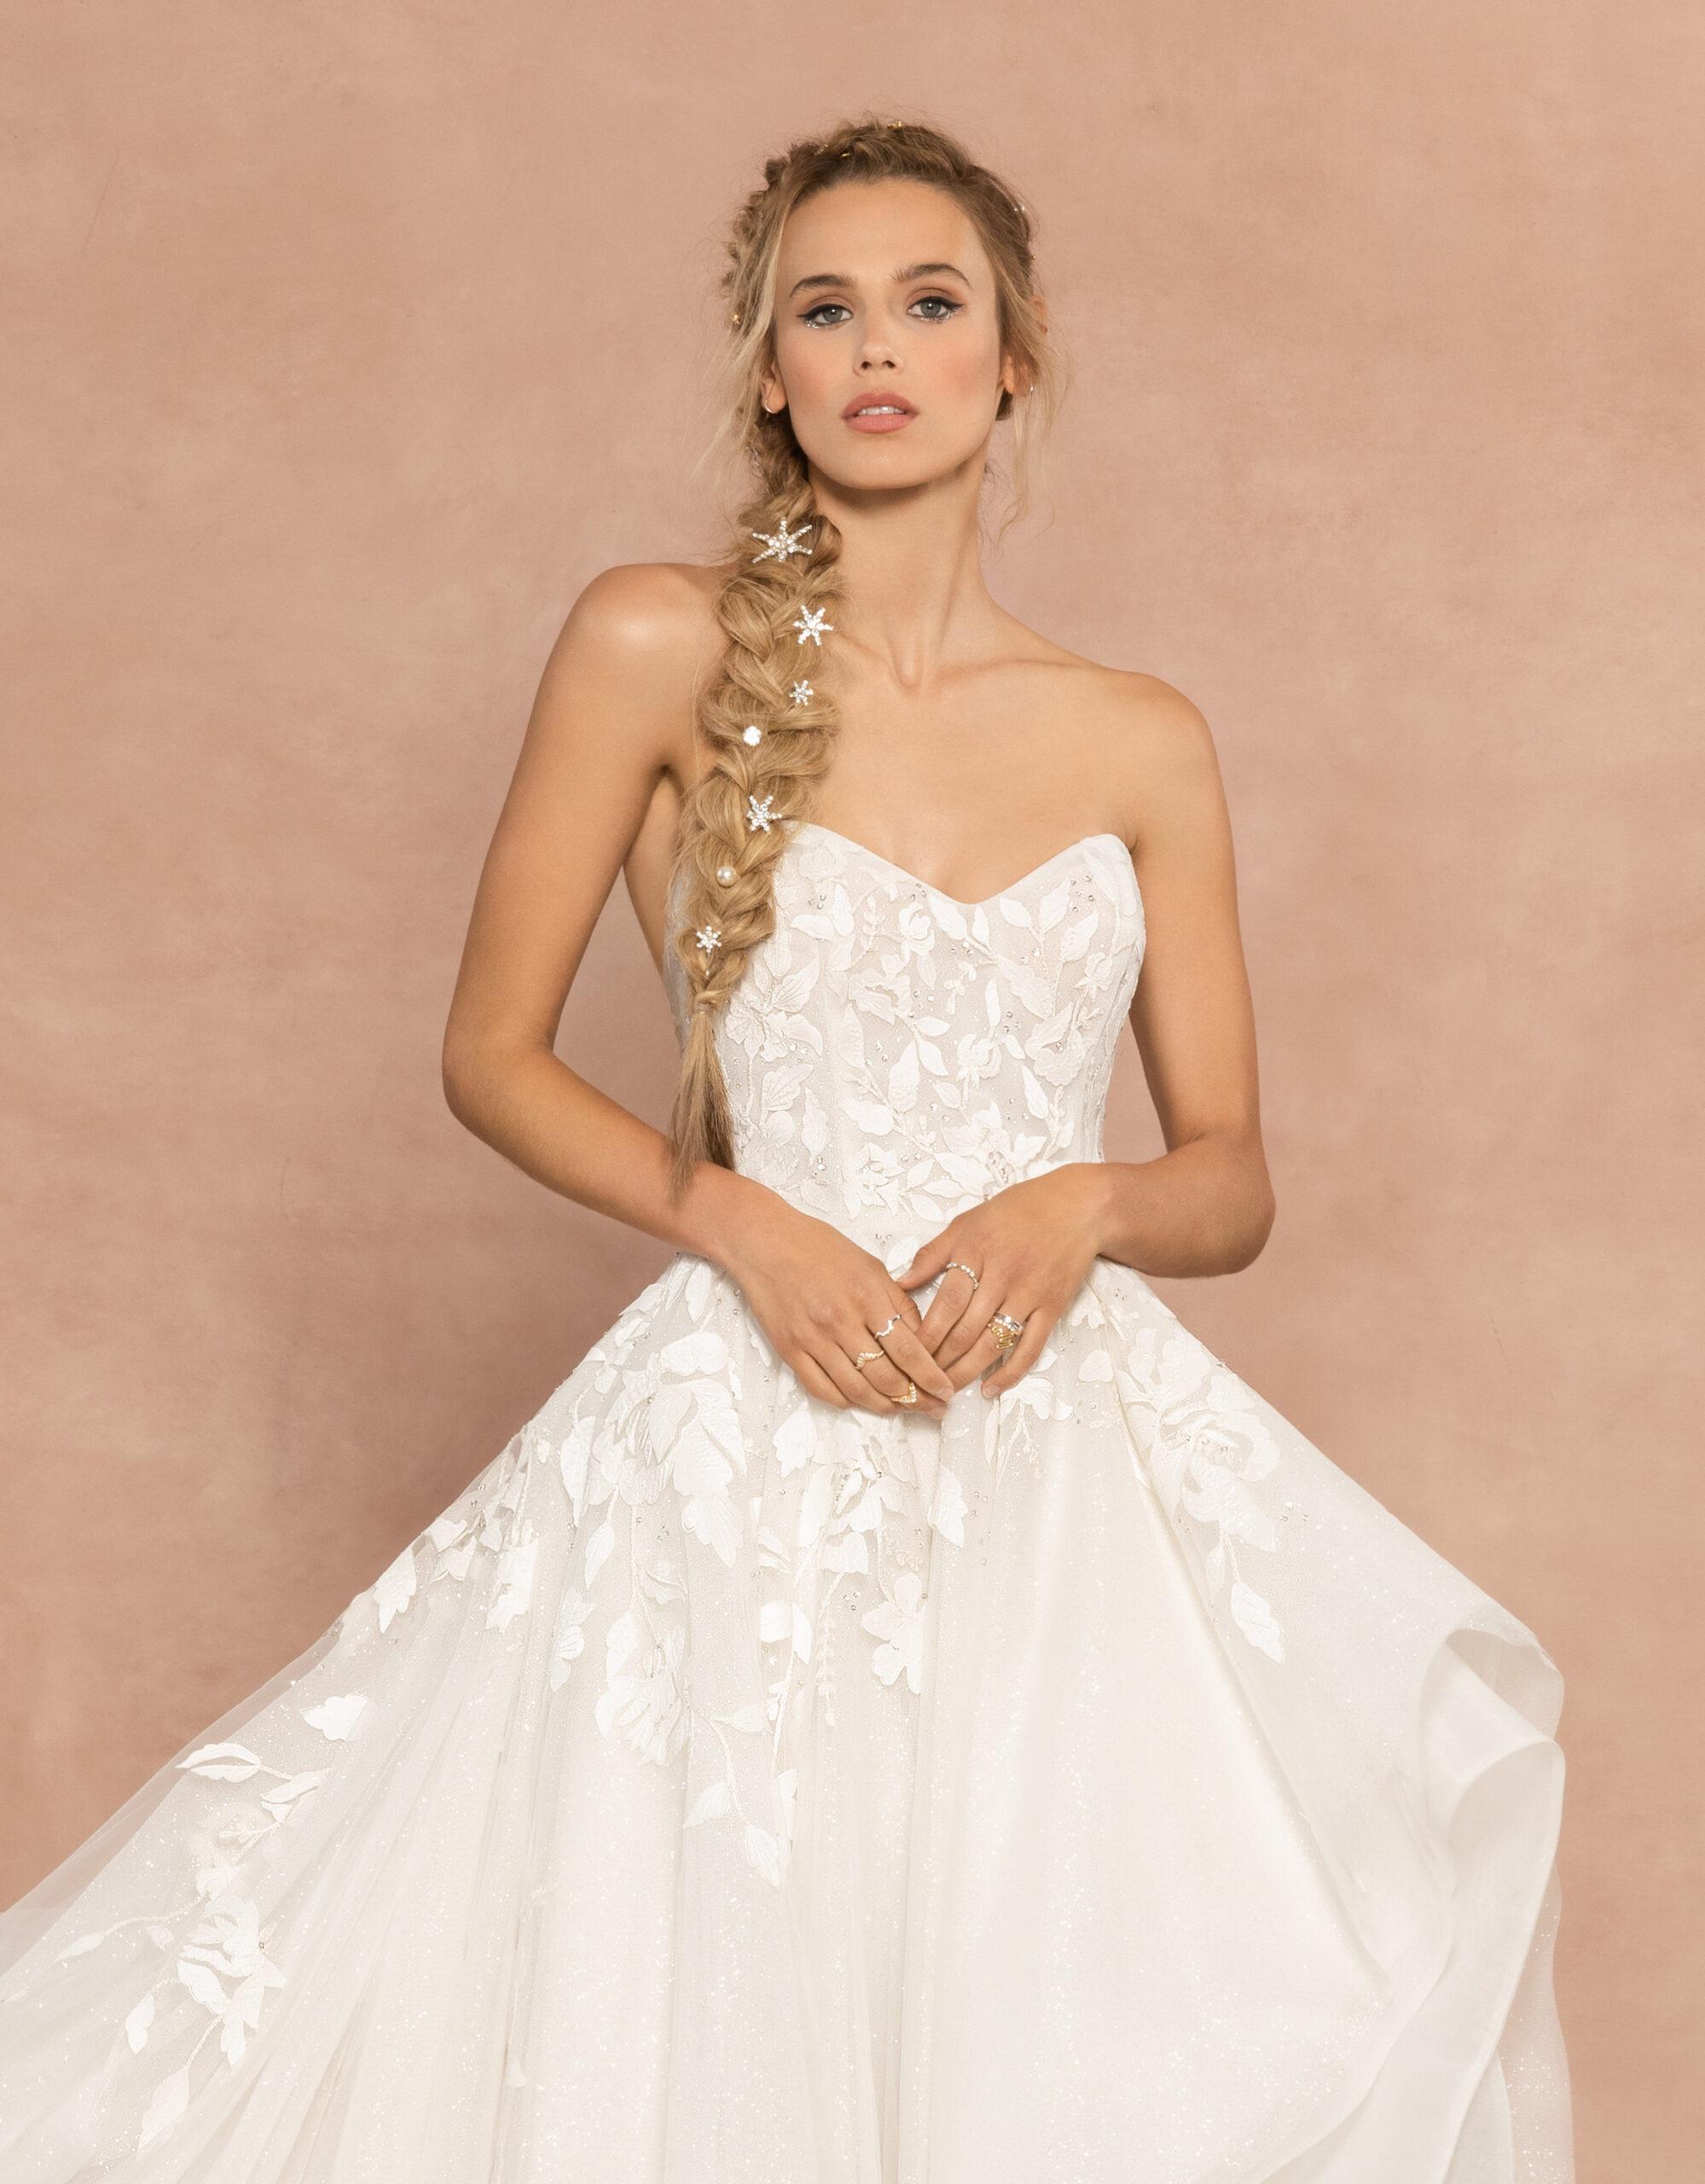 hayley-paige-bridal-spring-2020-style-62011-banksy_1